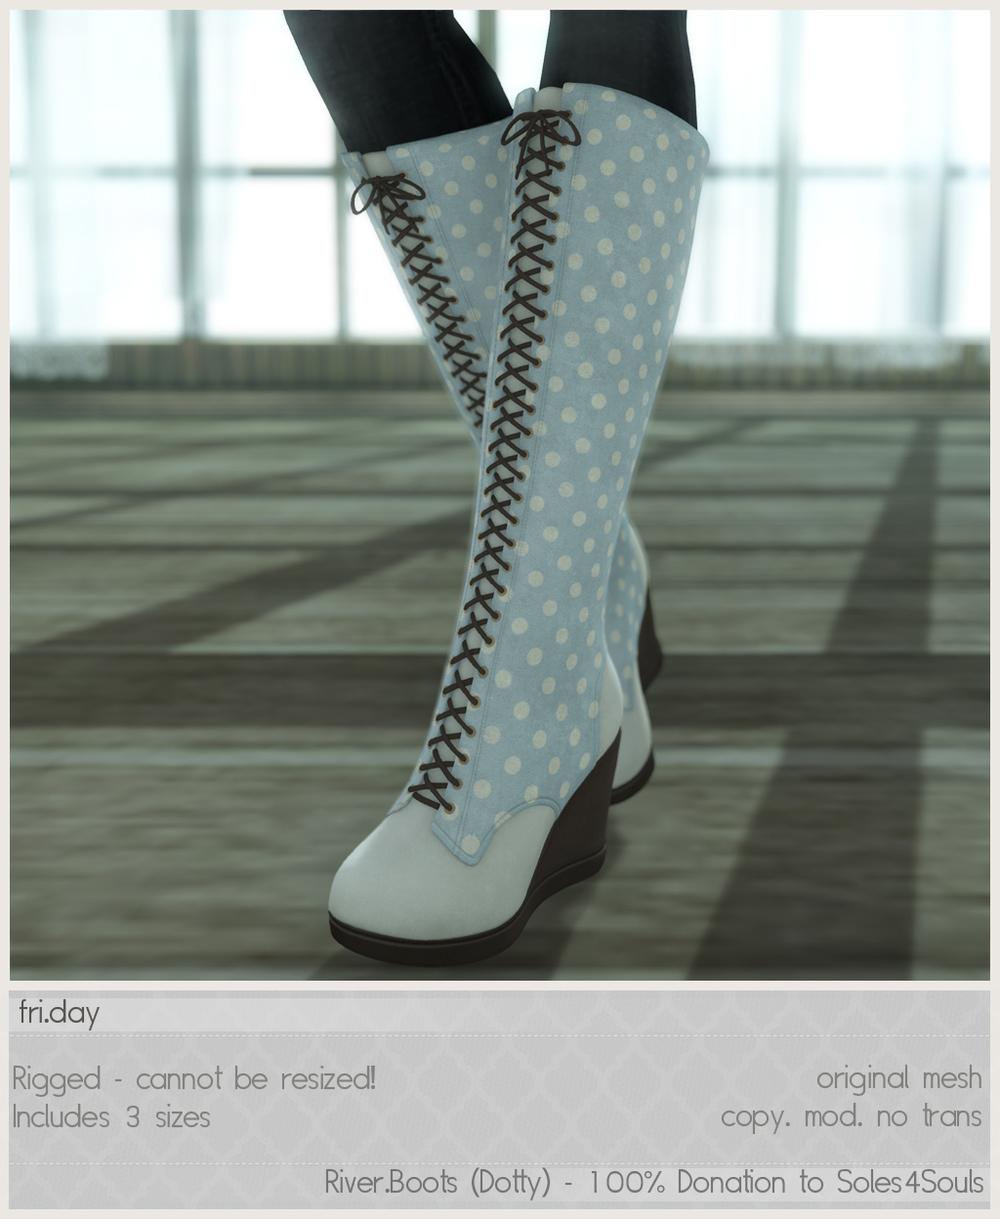 fri - River Boots Ad (Dotty) - Donation.jpg